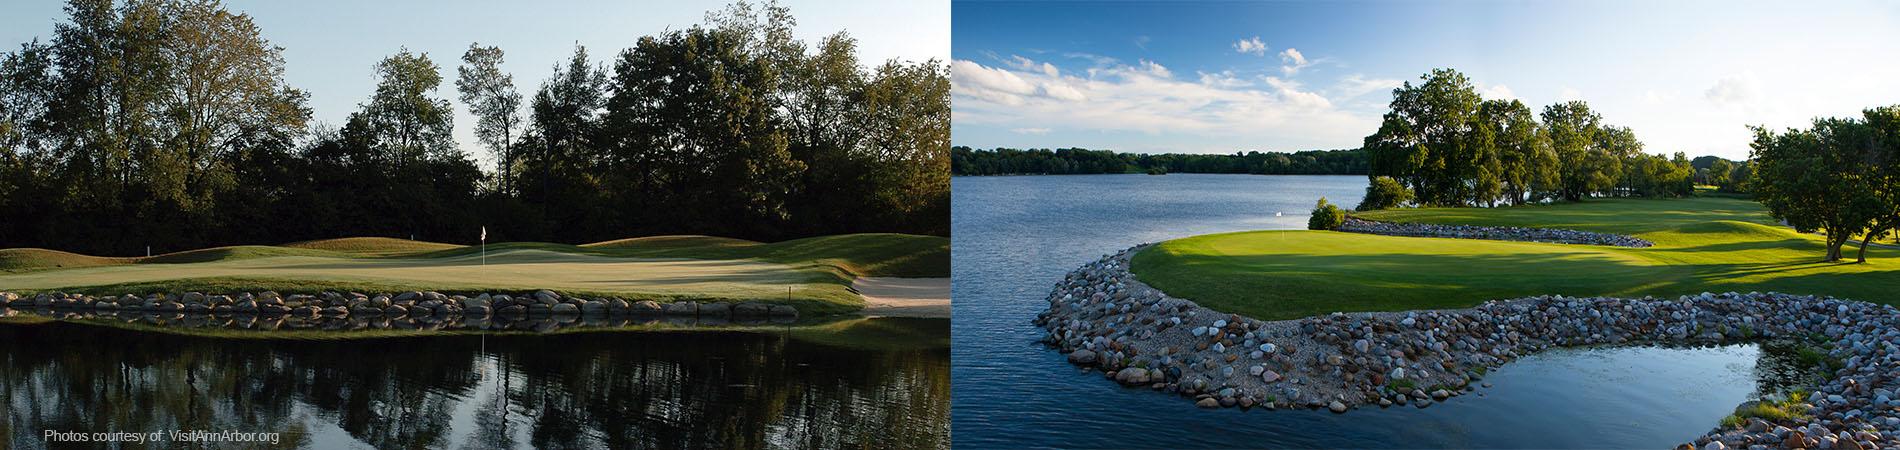 Ann Arbor Golf